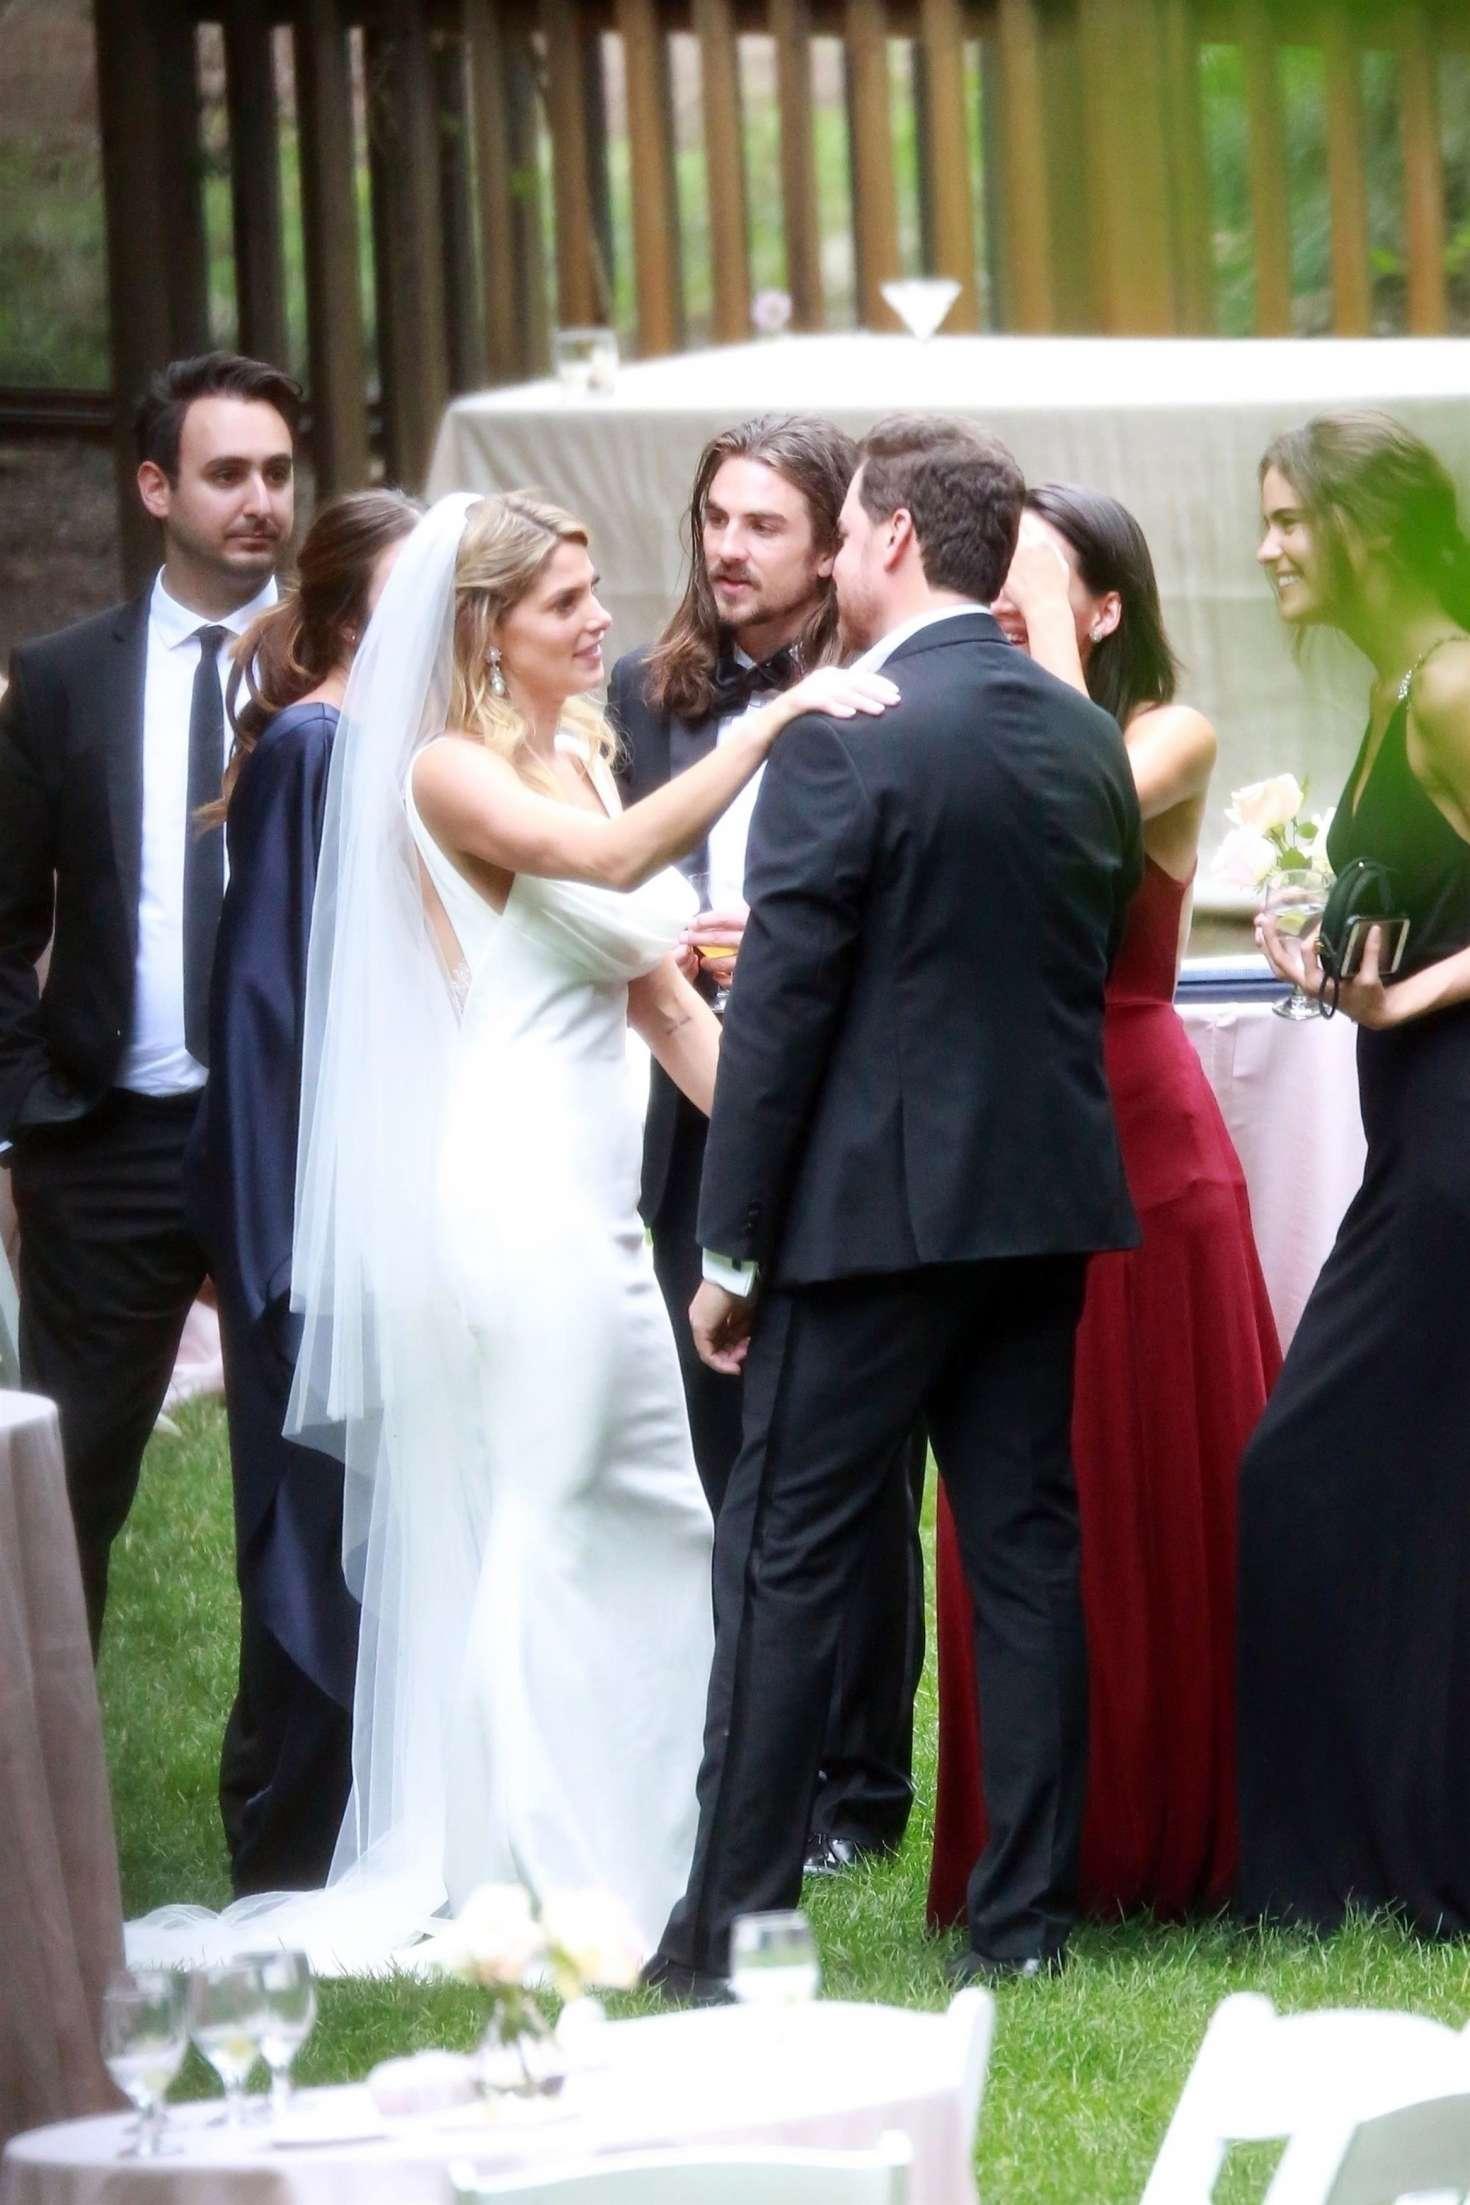 Ashley Greene and Paul Khoury - Their Wedding Reception in San Jose